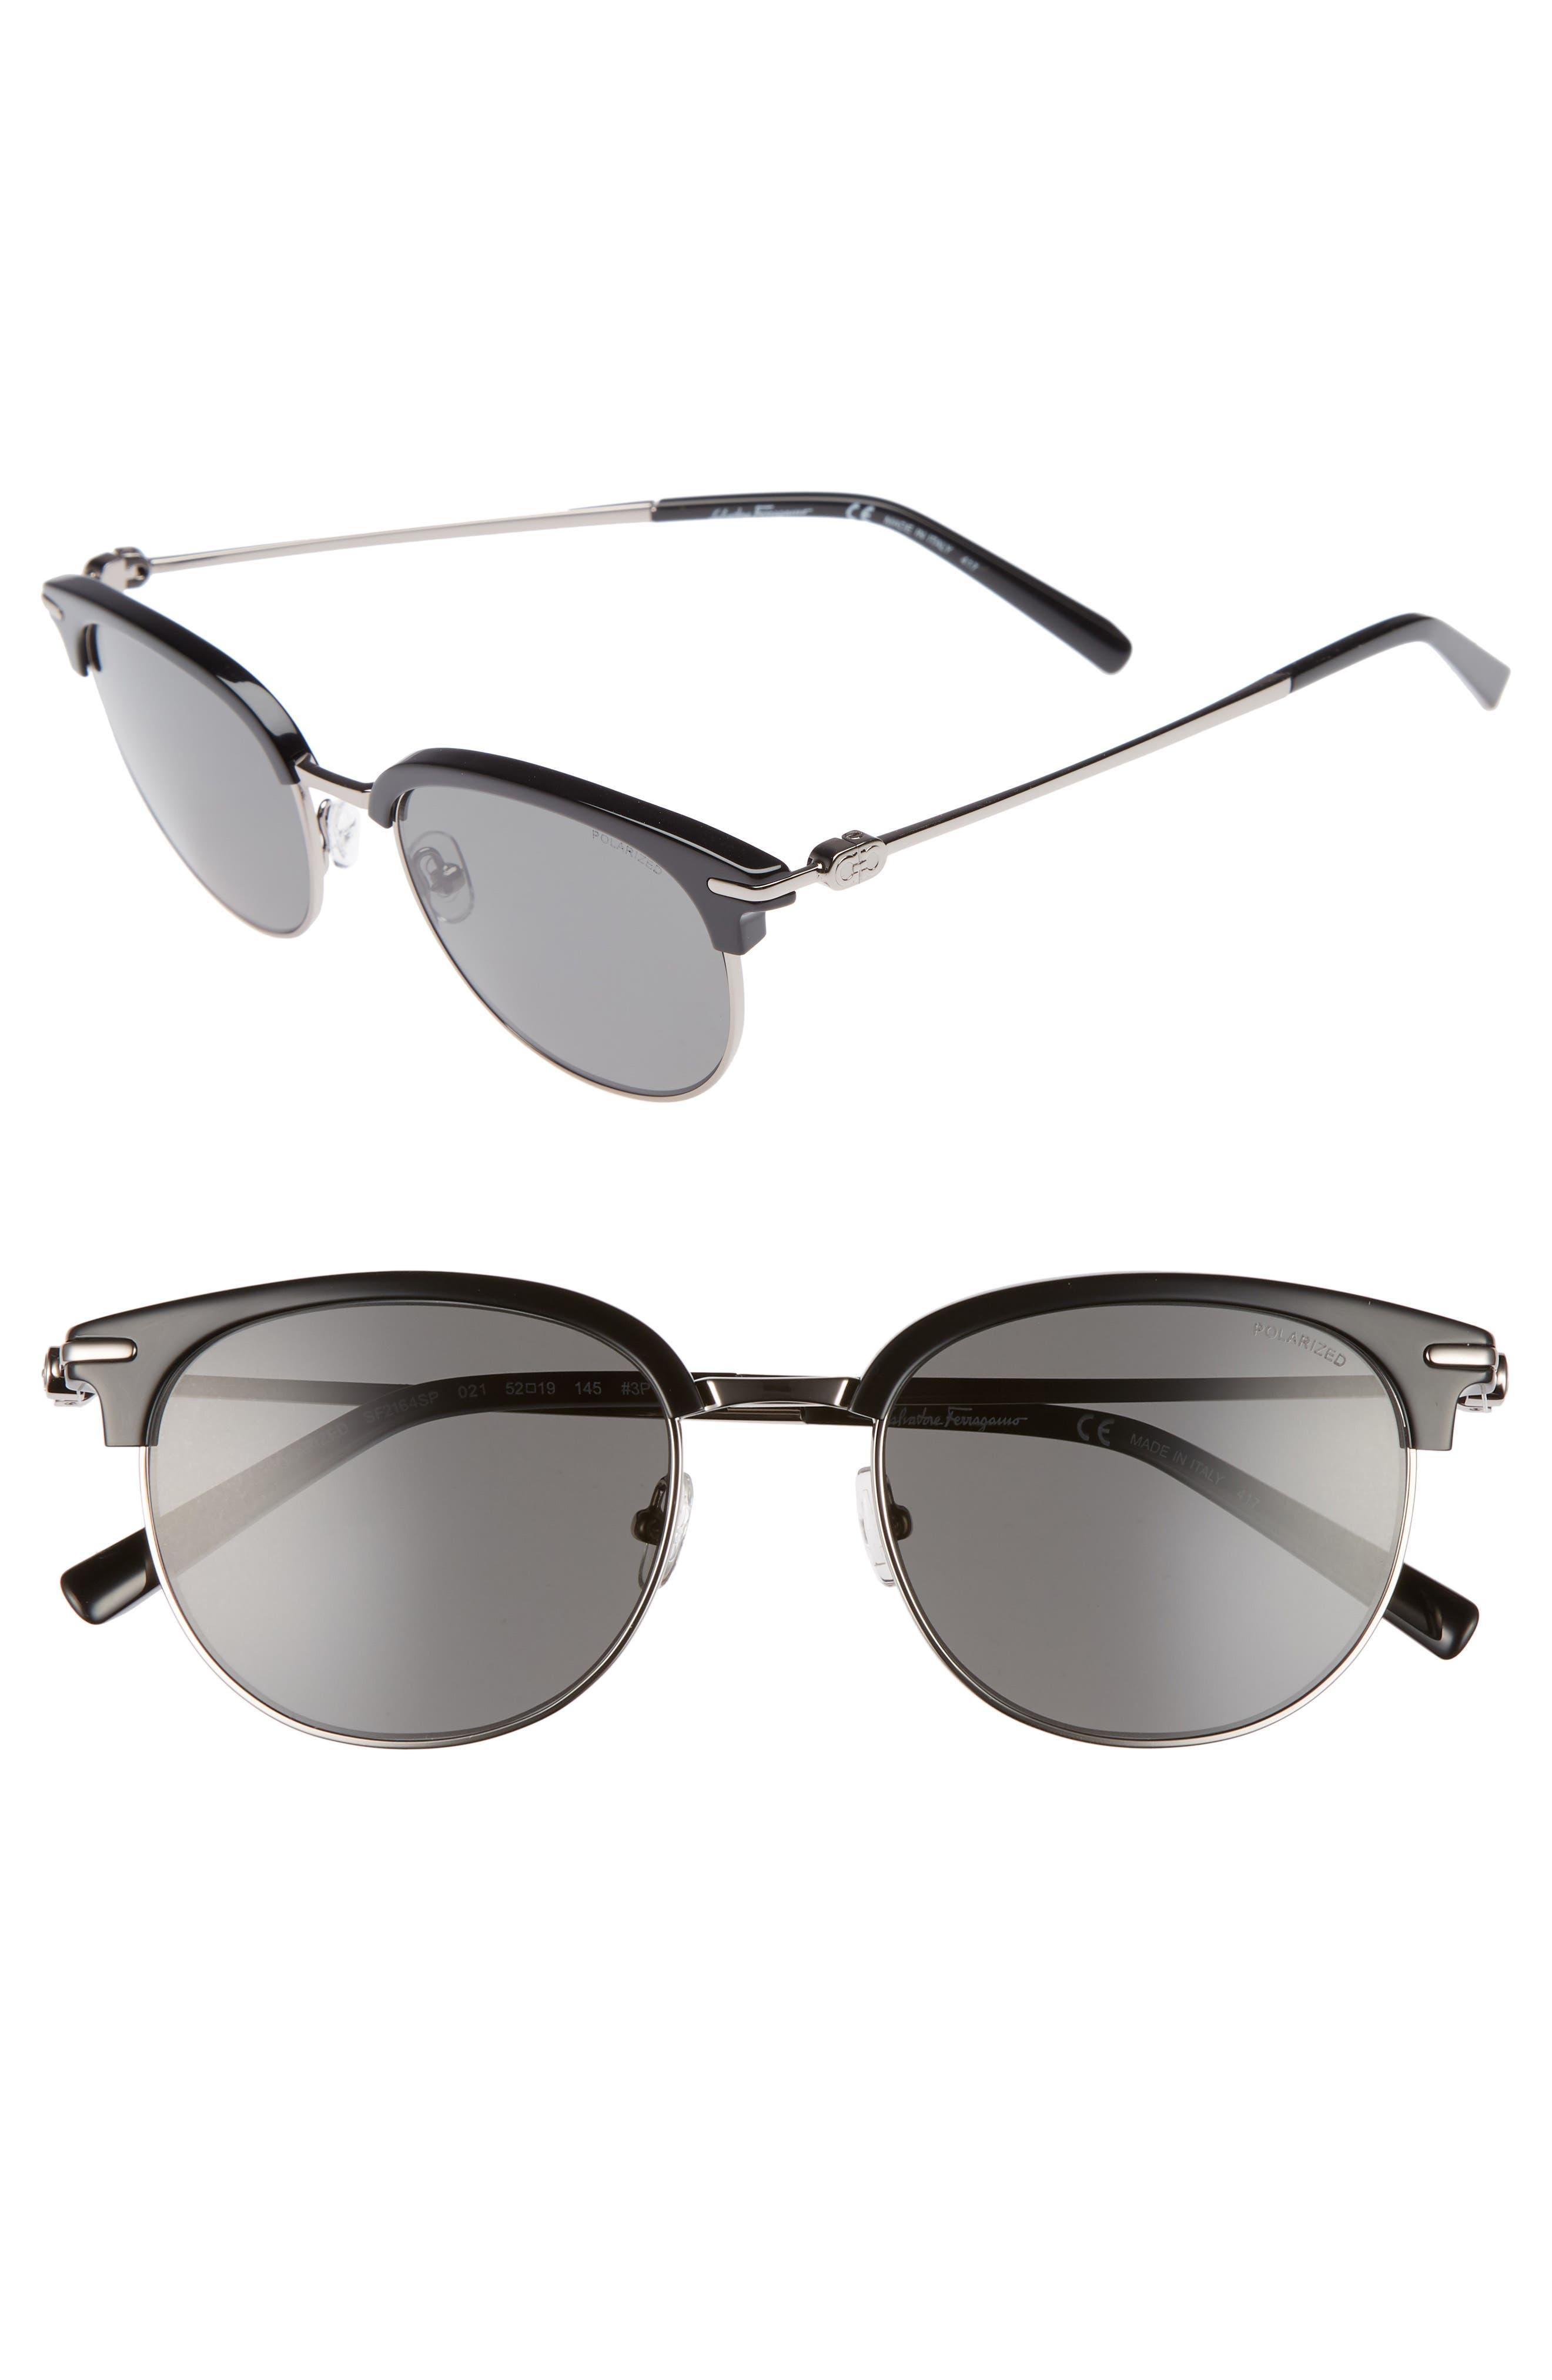 Double Gancio 52mm Polarized Sunglasses,                         Main,                         color, Black/ Ruthenium